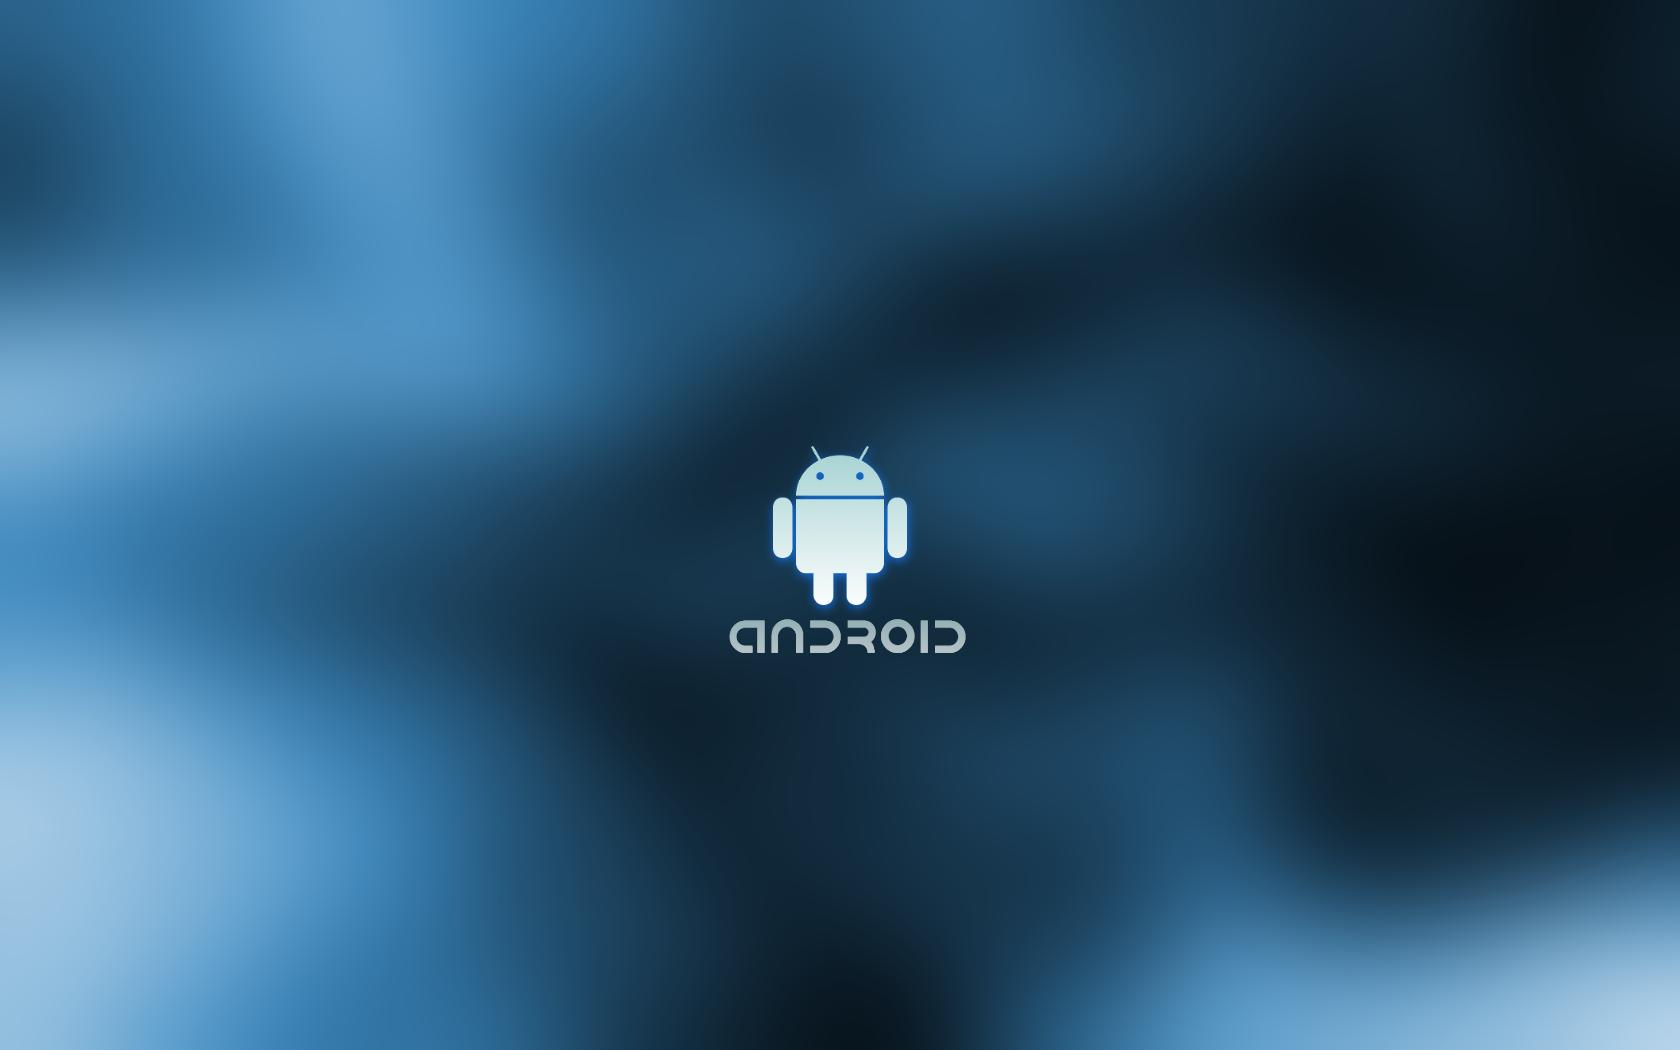 phone wallpaper Android Phone Wallpaper 1680x1050